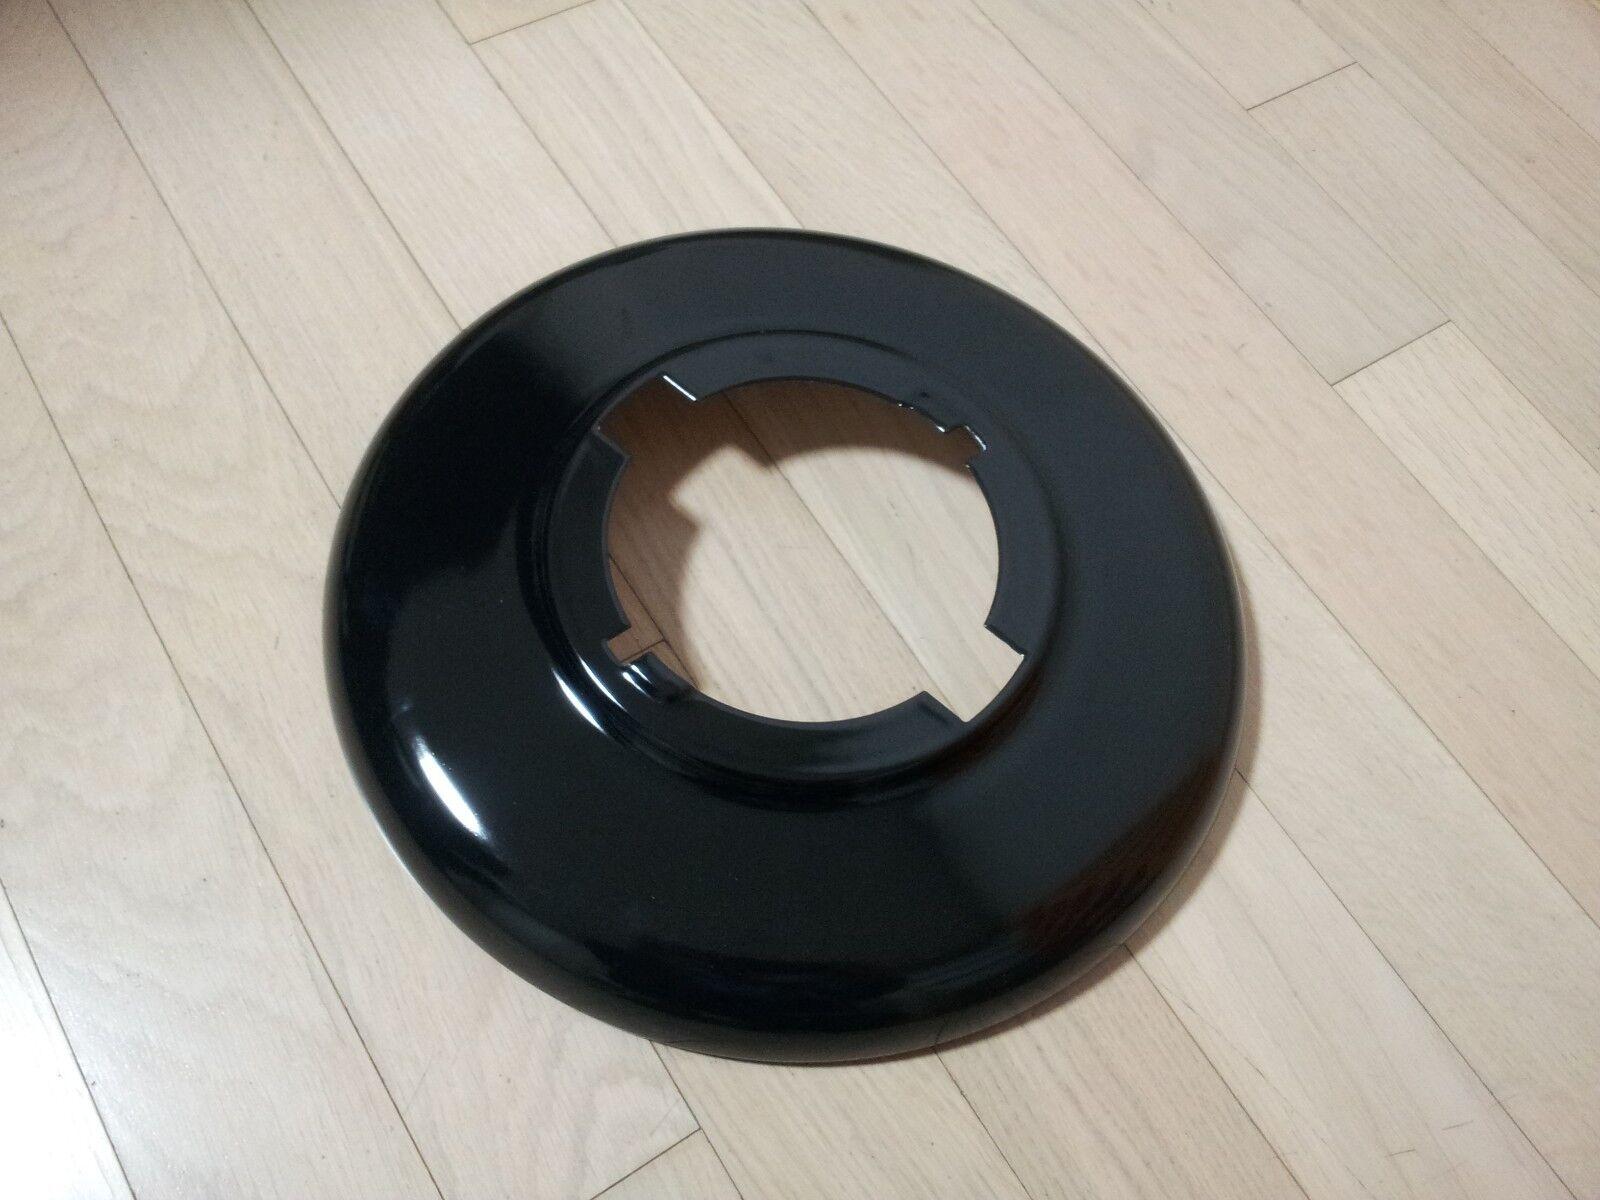 Enamel coating Reflector for Radius lantern   lamp